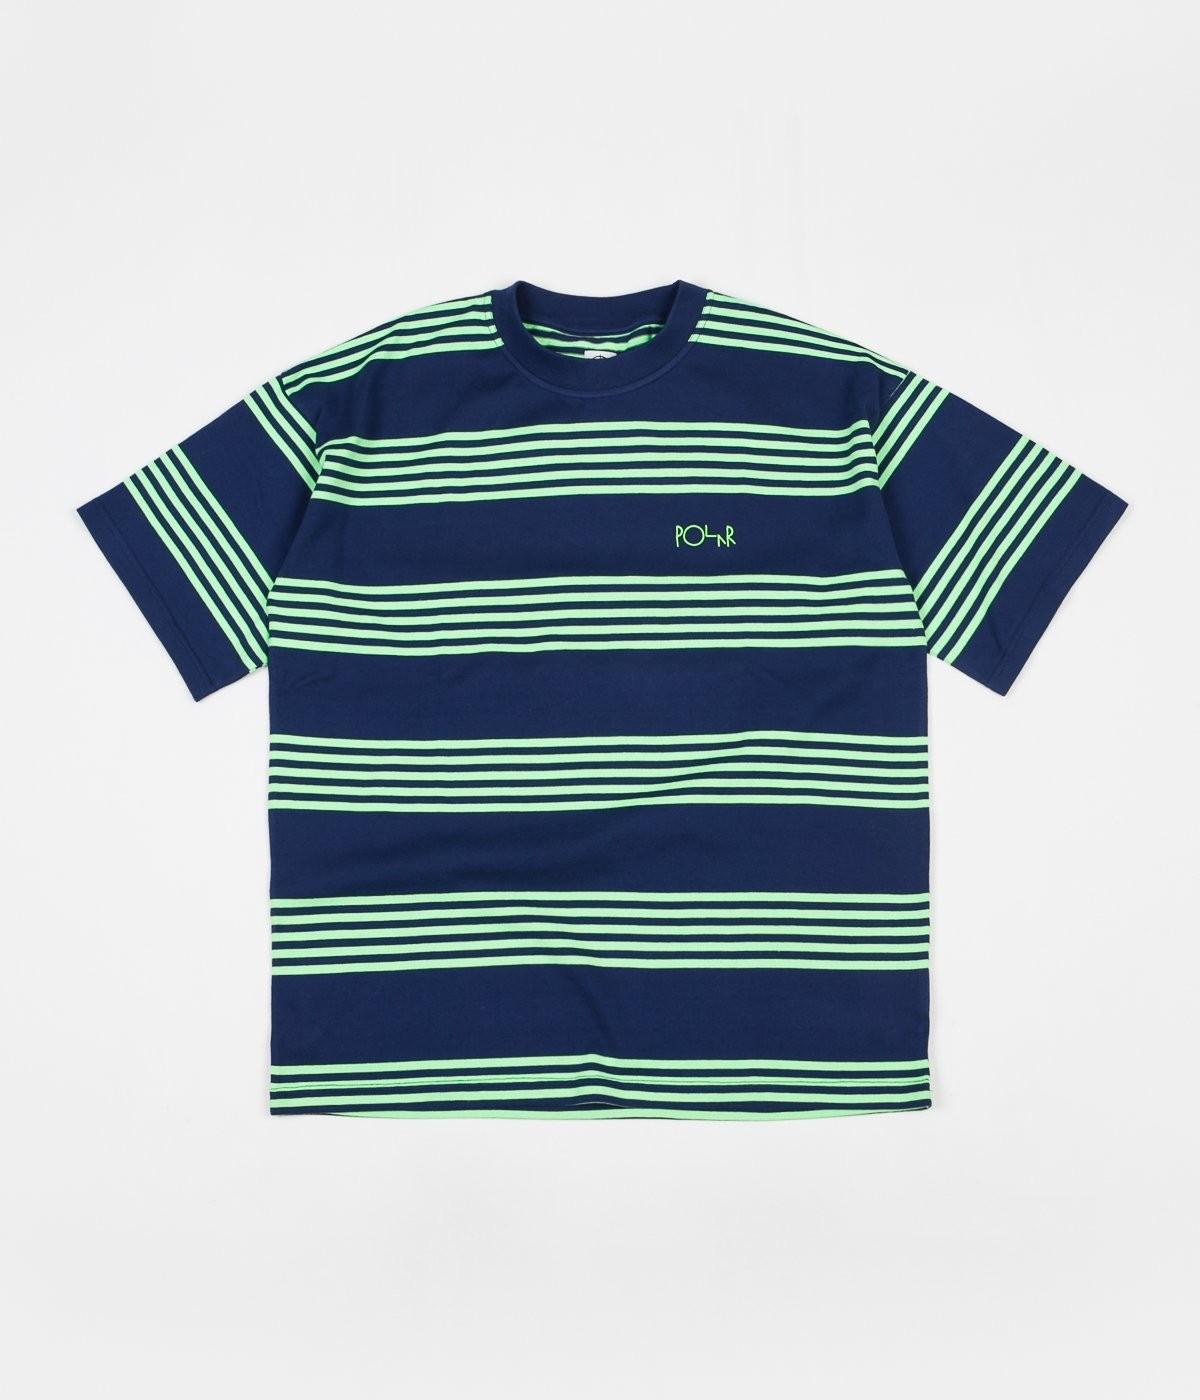 bd47c619cca t-shirt-polar-skate-co-striped-surf-dark-blue-summer-green.jpg